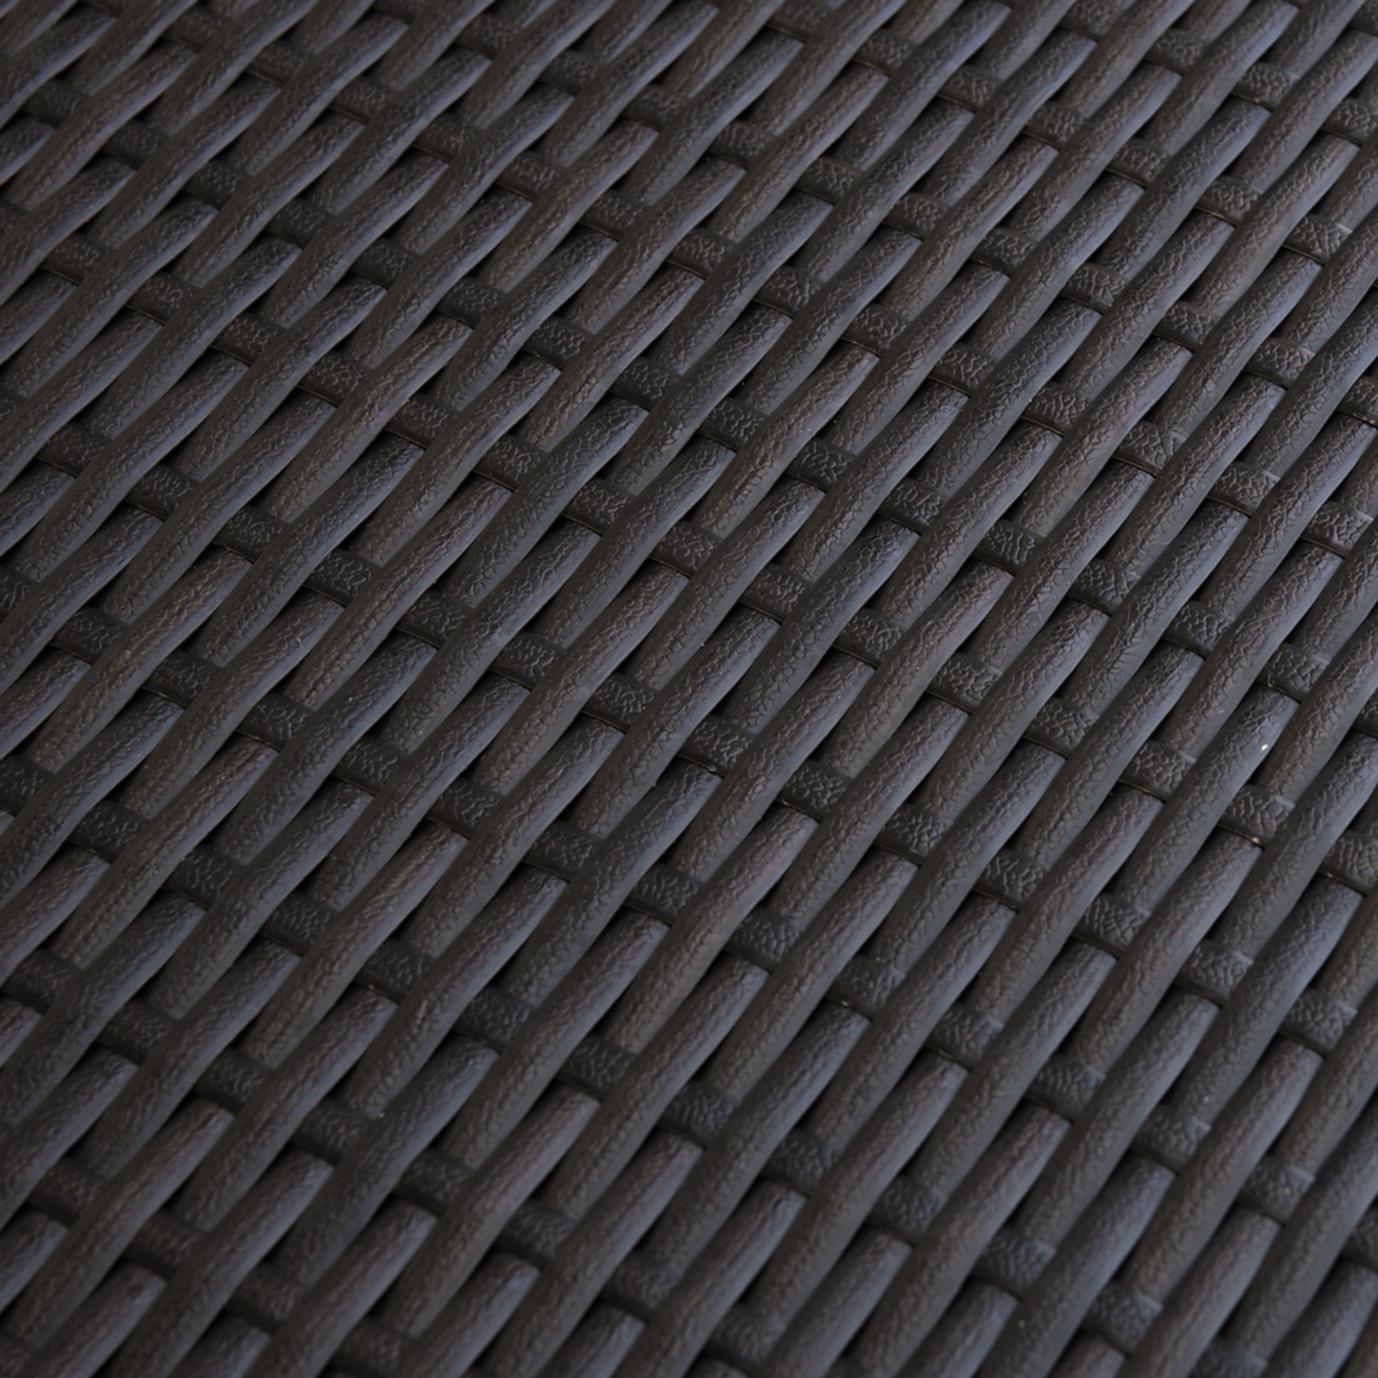 Deco™ 5 Piece Barstool Set - Bliss Blue